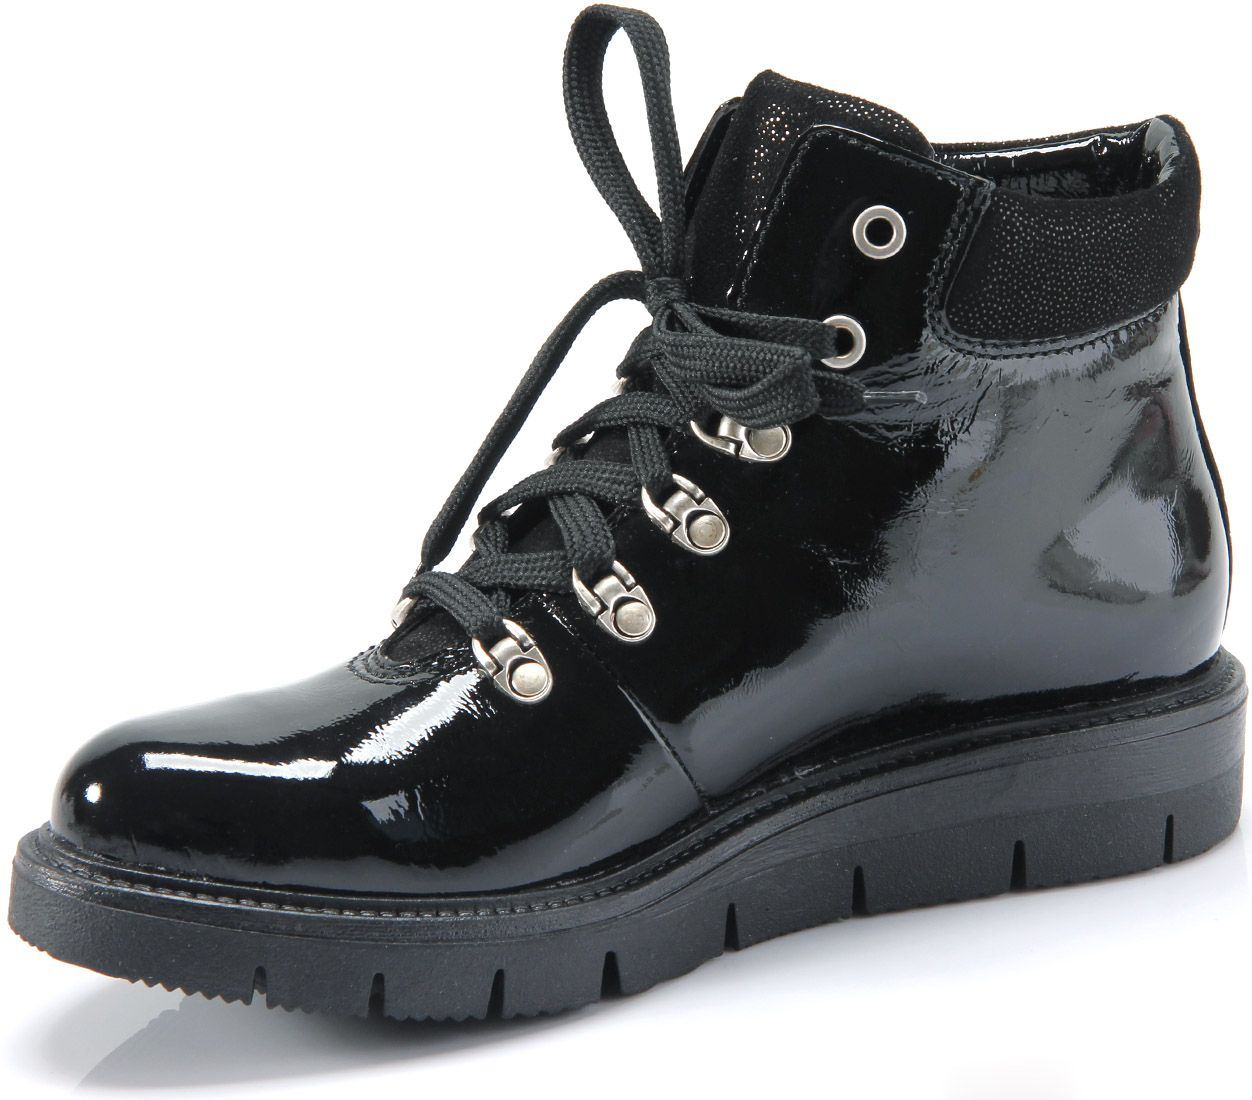 Botki Venezia 05a003 Cza R37 Lupa1x 5869369154 Oficjalne Archiwum Allegro Hiking Boots Shoes Boots